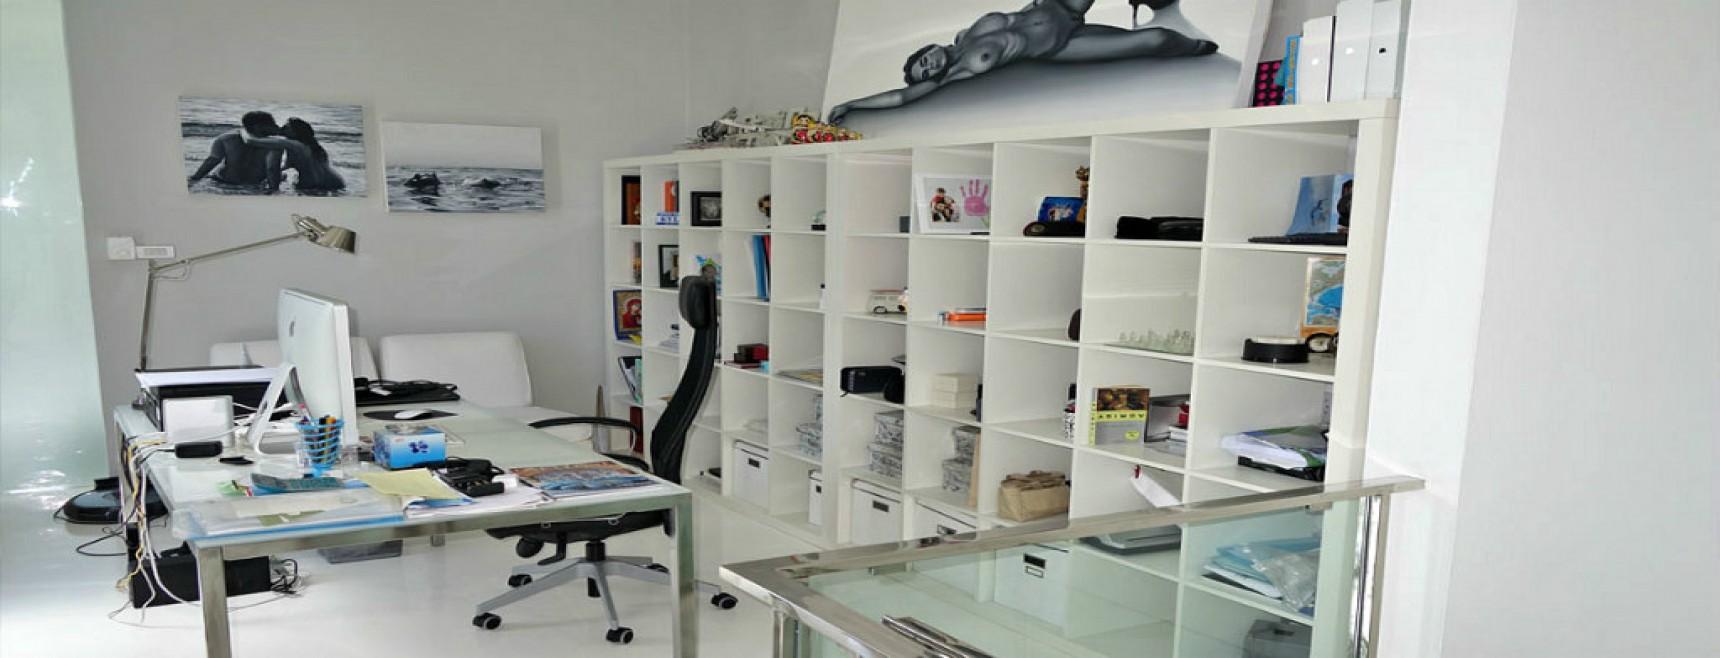 5 Bedrooms, Villa, Residential Sales, 5 Bathrooms, Listing ID 1396, Koh Samui,